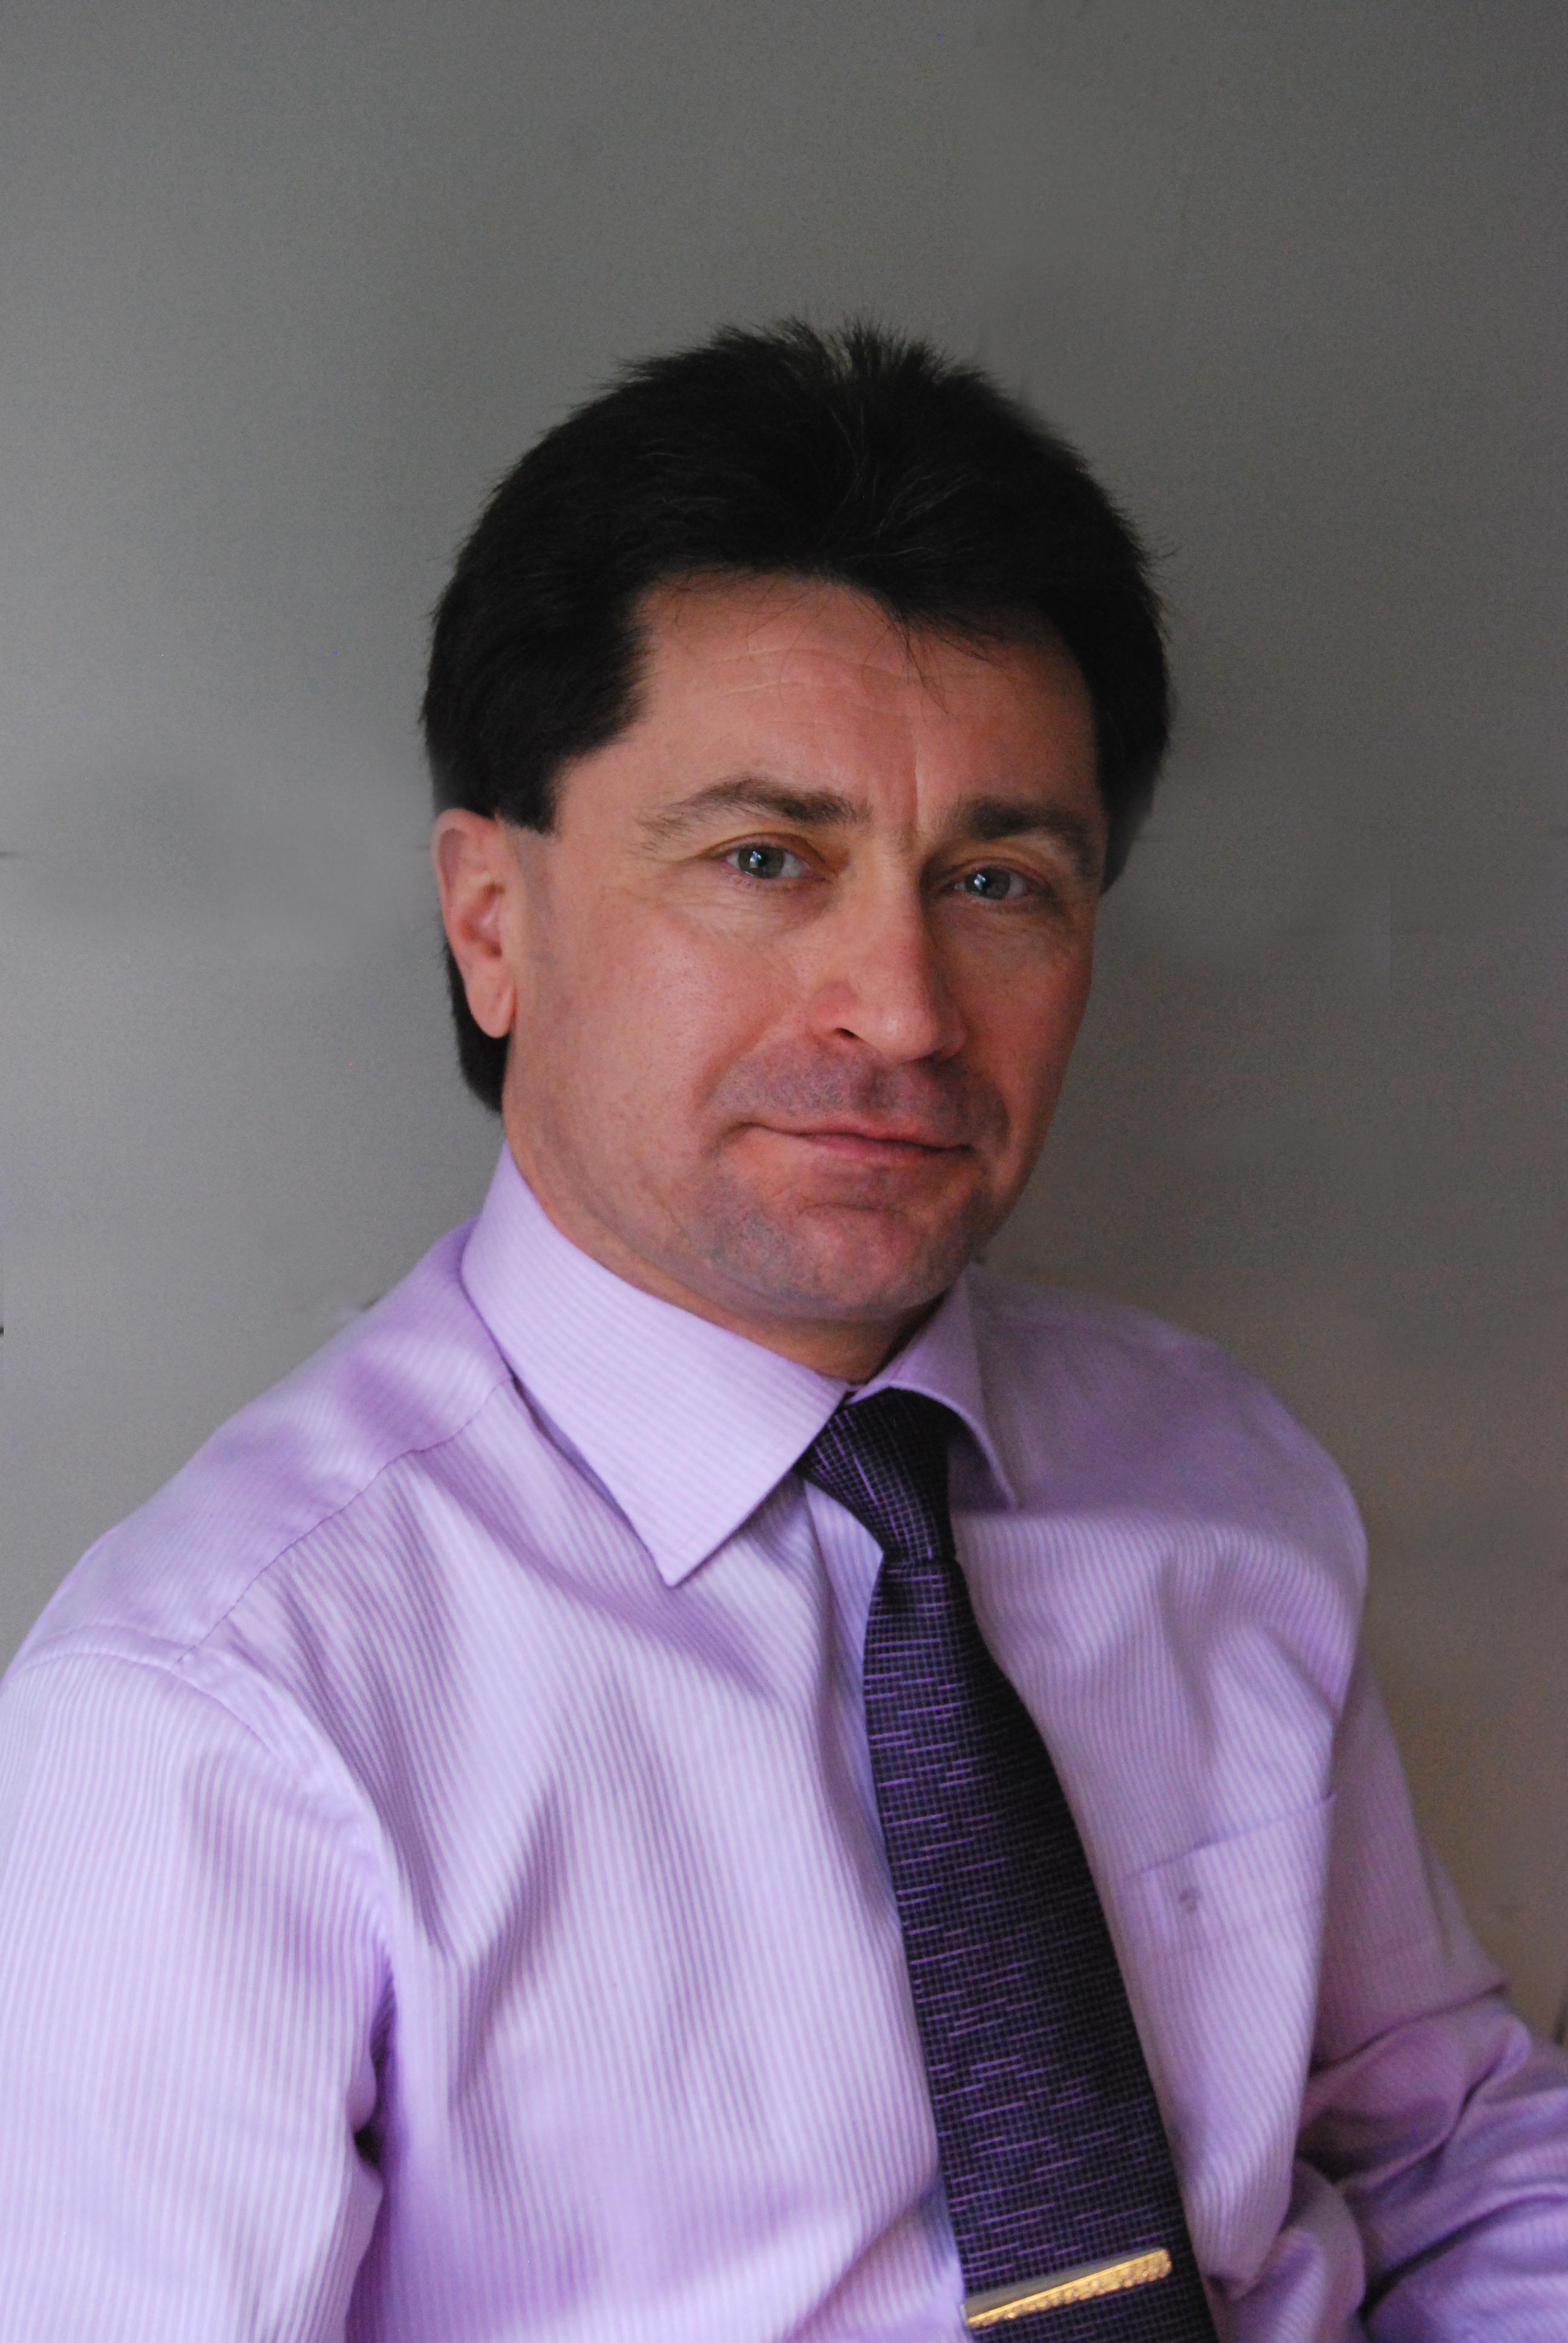 ШАБАНОВ Александр Владимирович